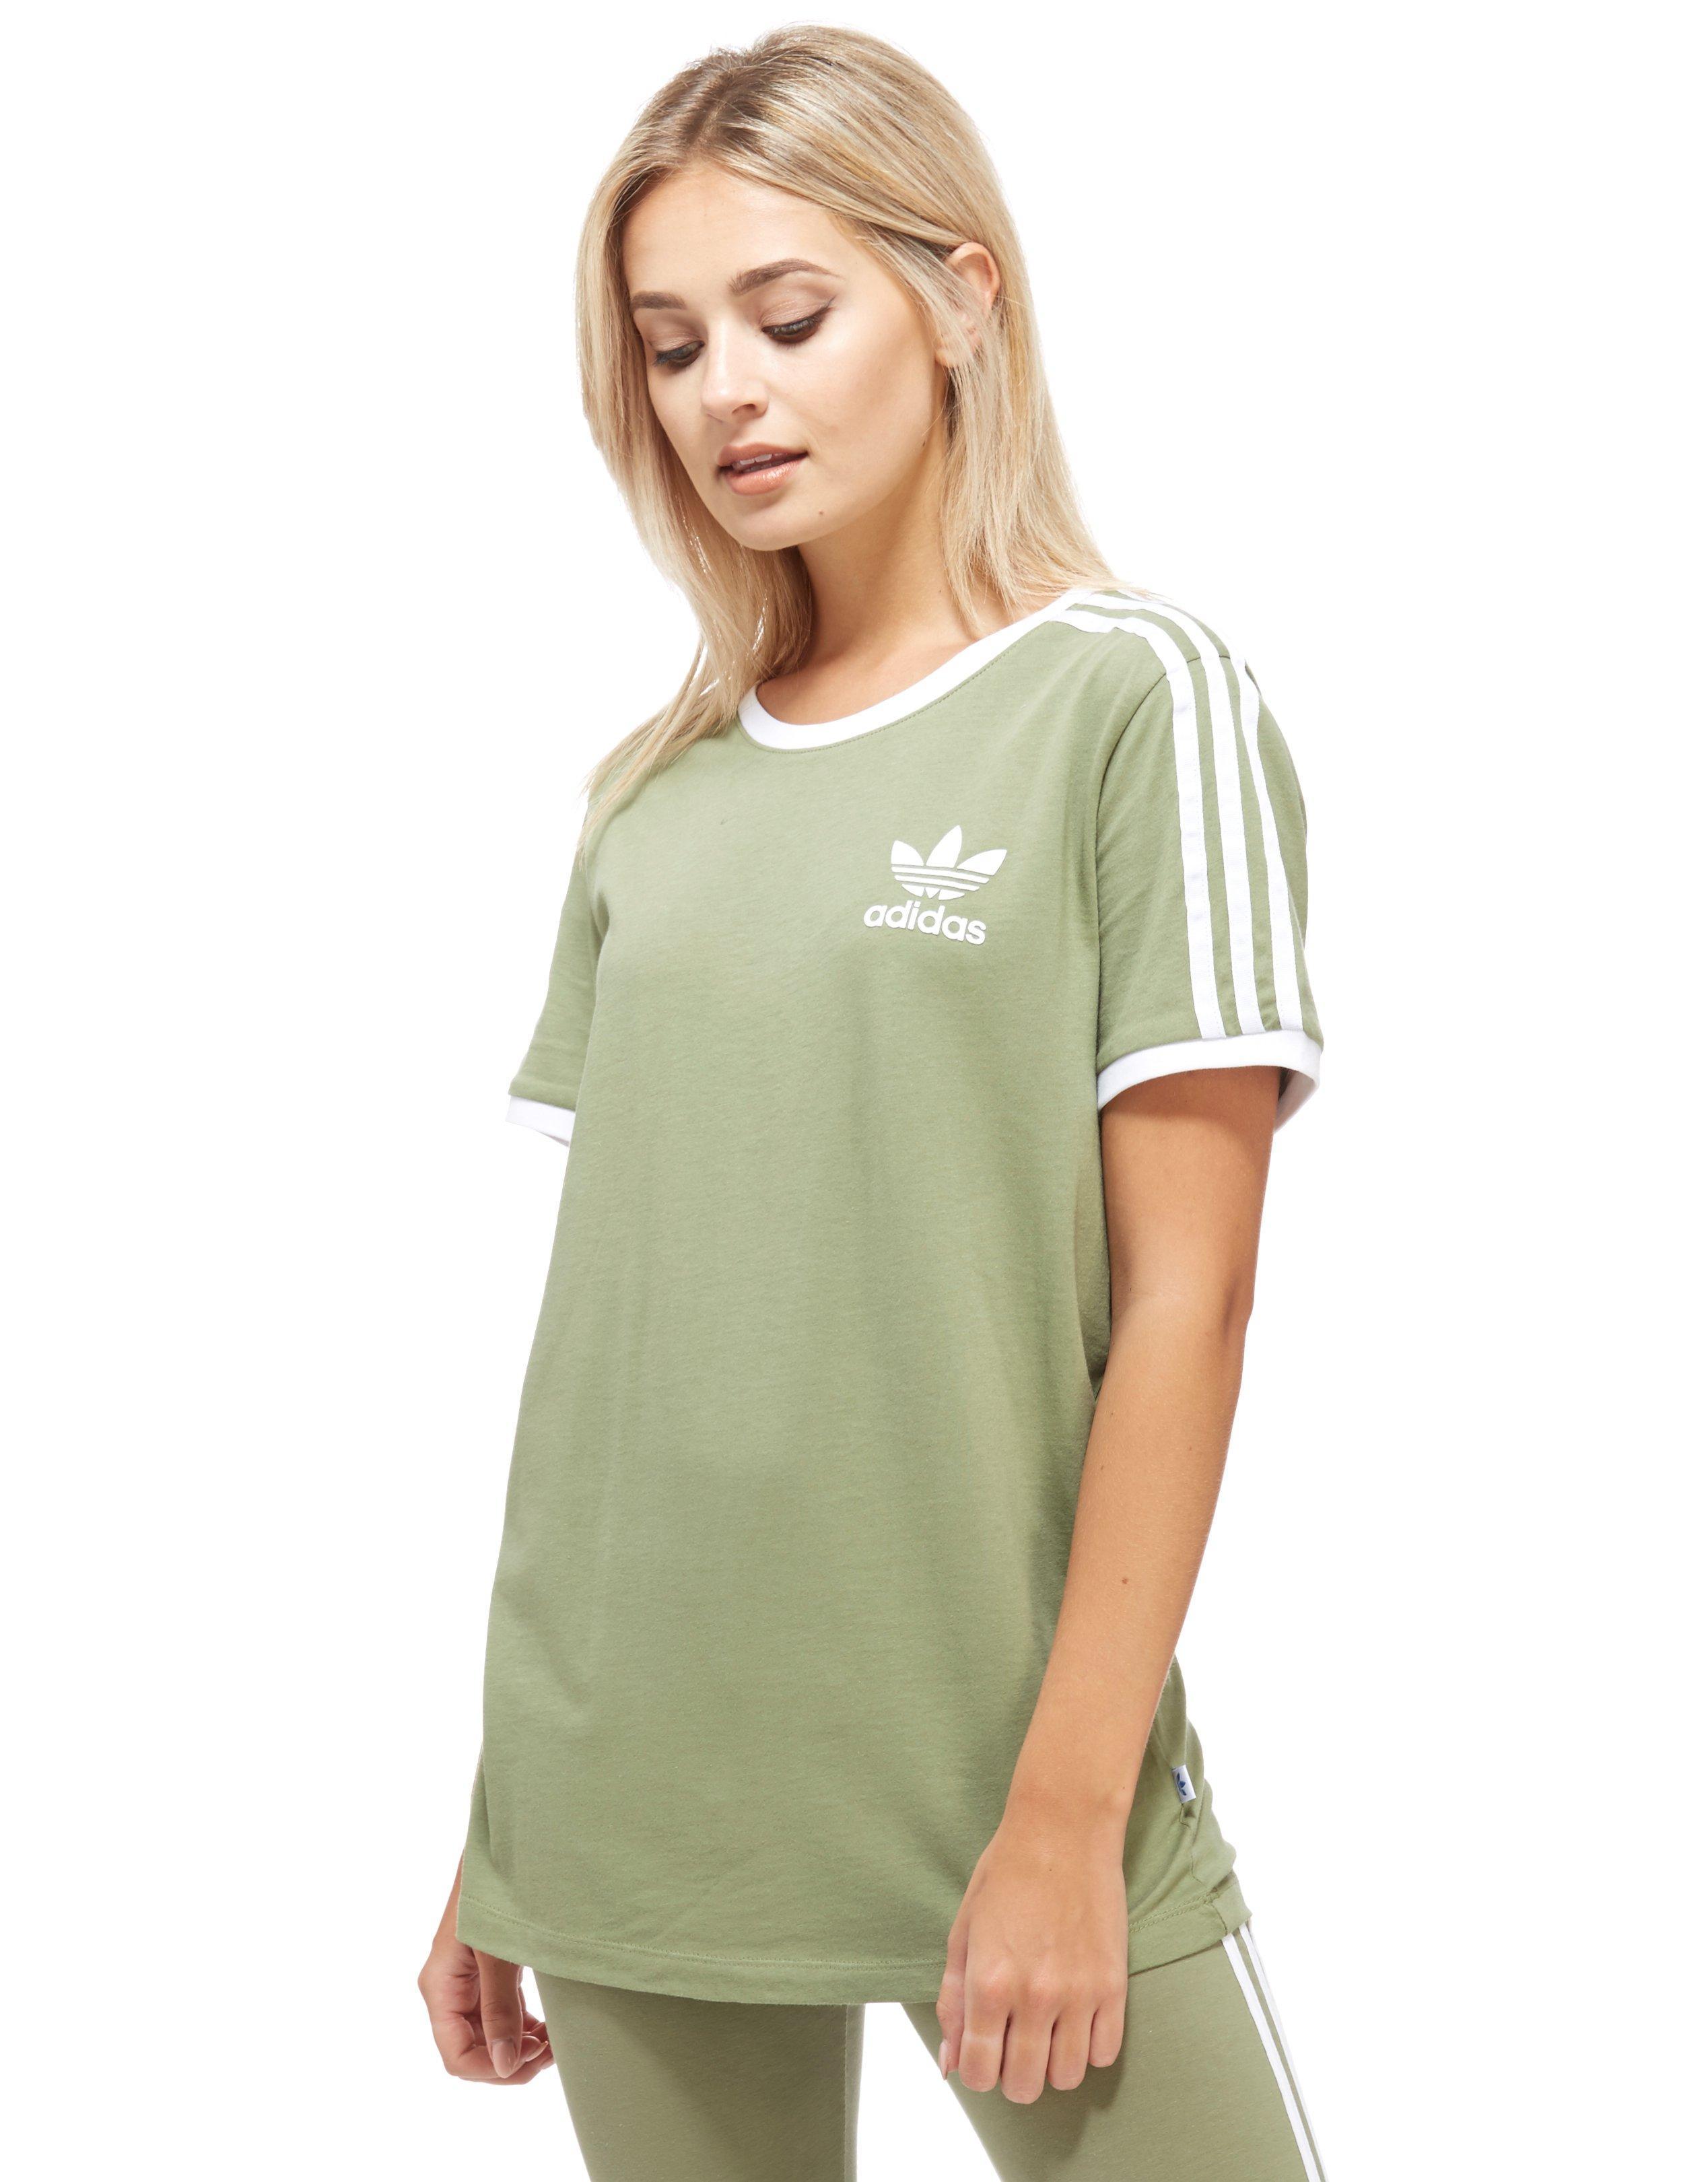 adidas originals california t shirt women's